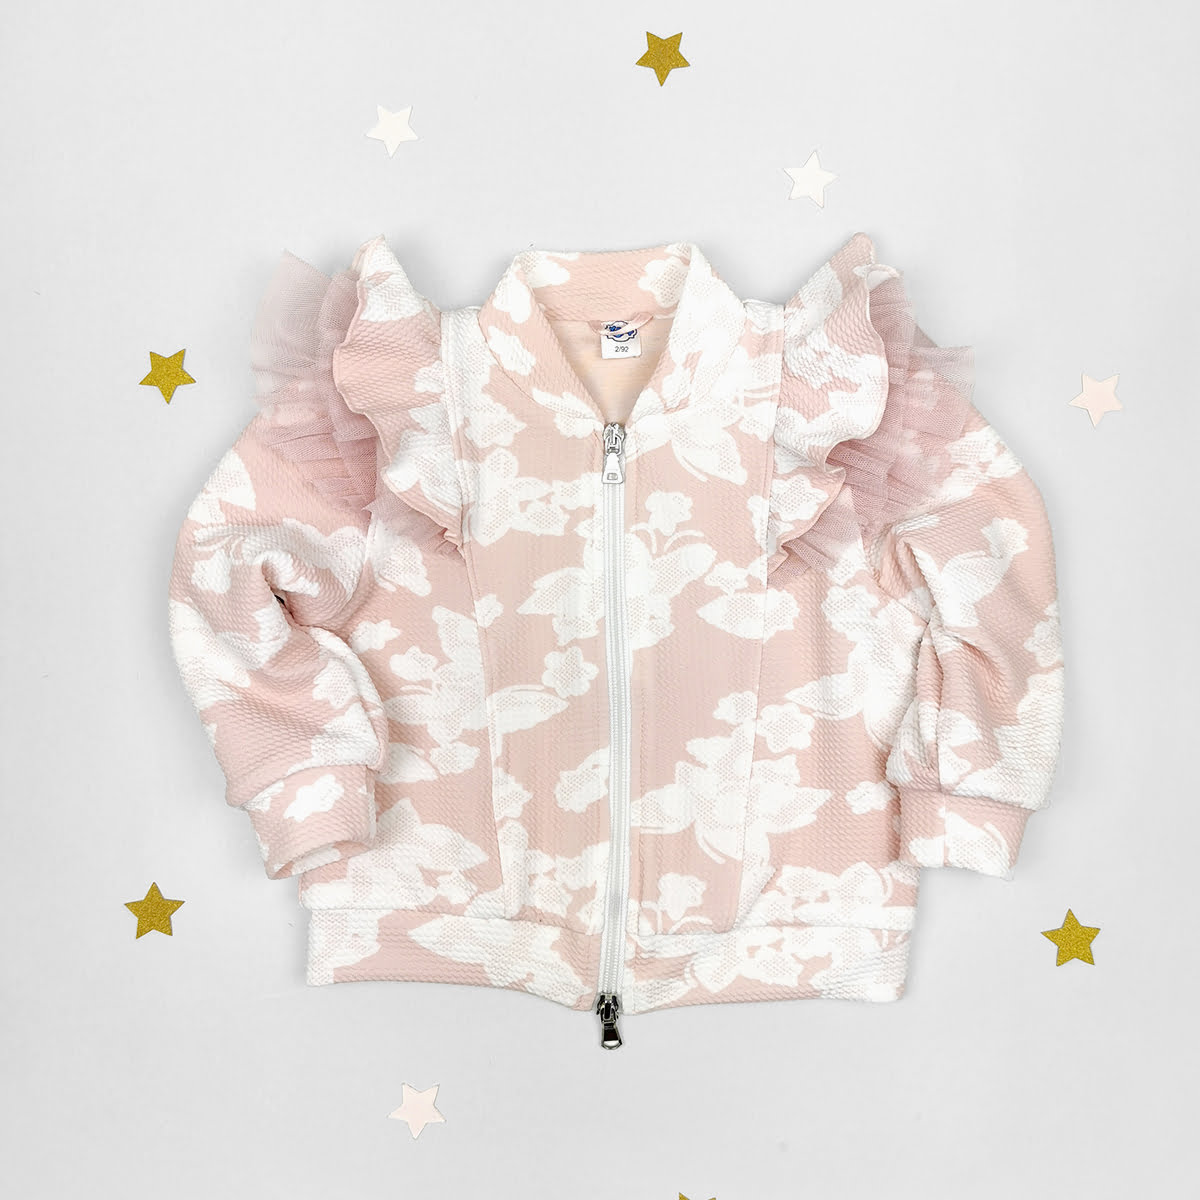 pastelna šare jaknica za bebe i djevojčice